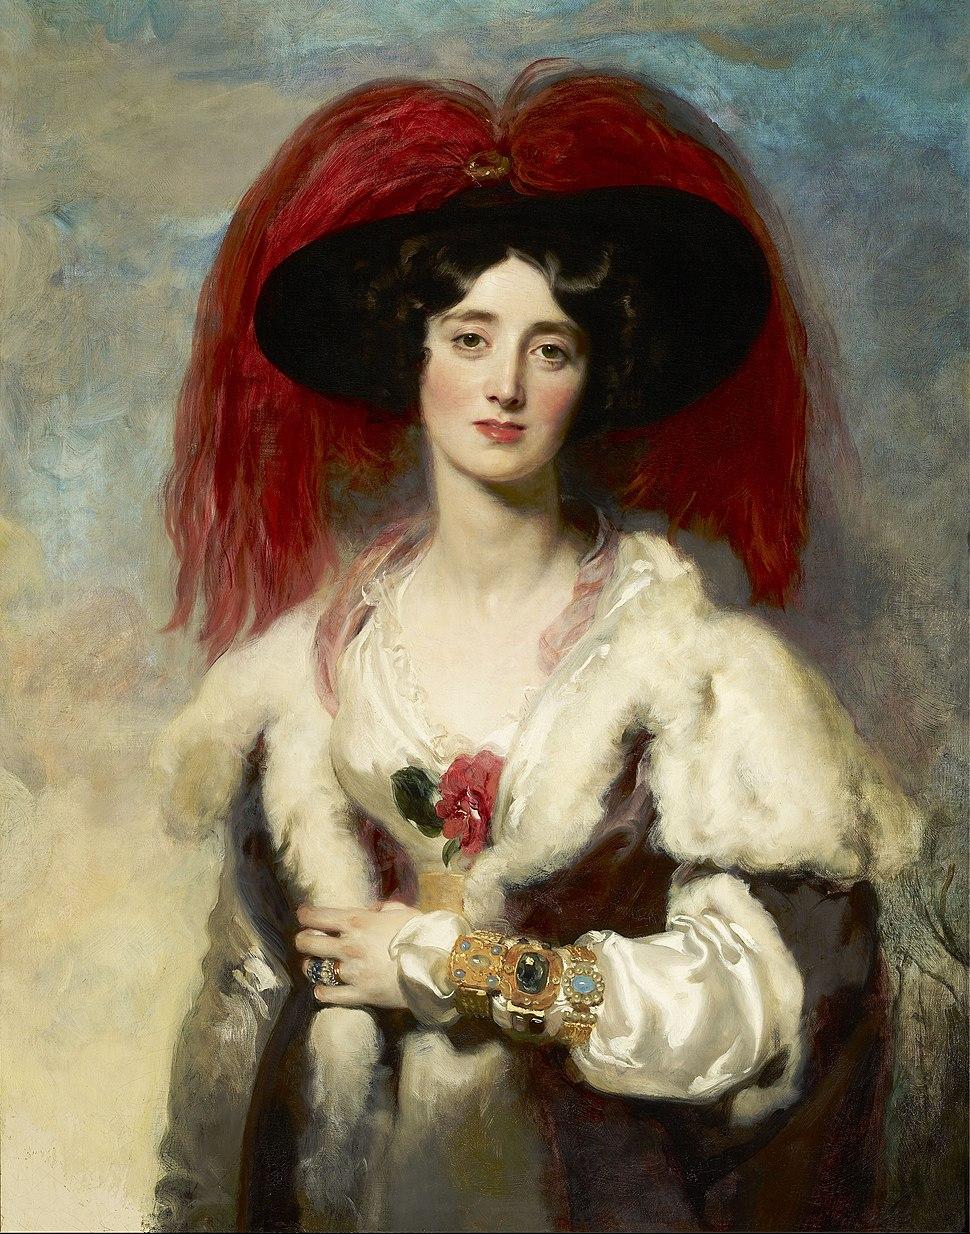 Julia, Lady Peel - Lawrence 1827